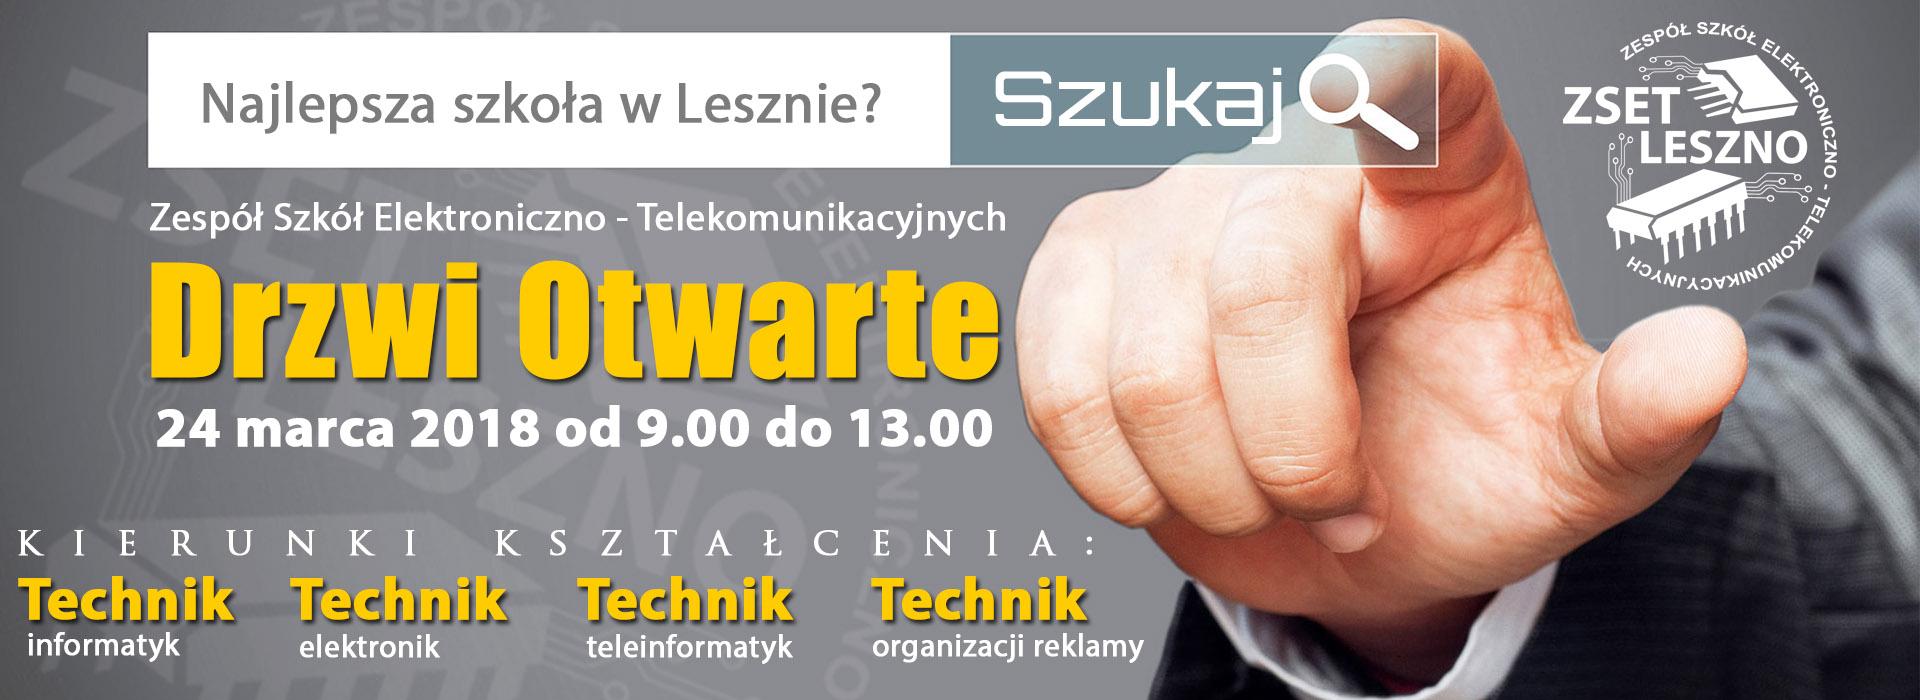 projekt_drzwi_otwarte_KC_v2_new